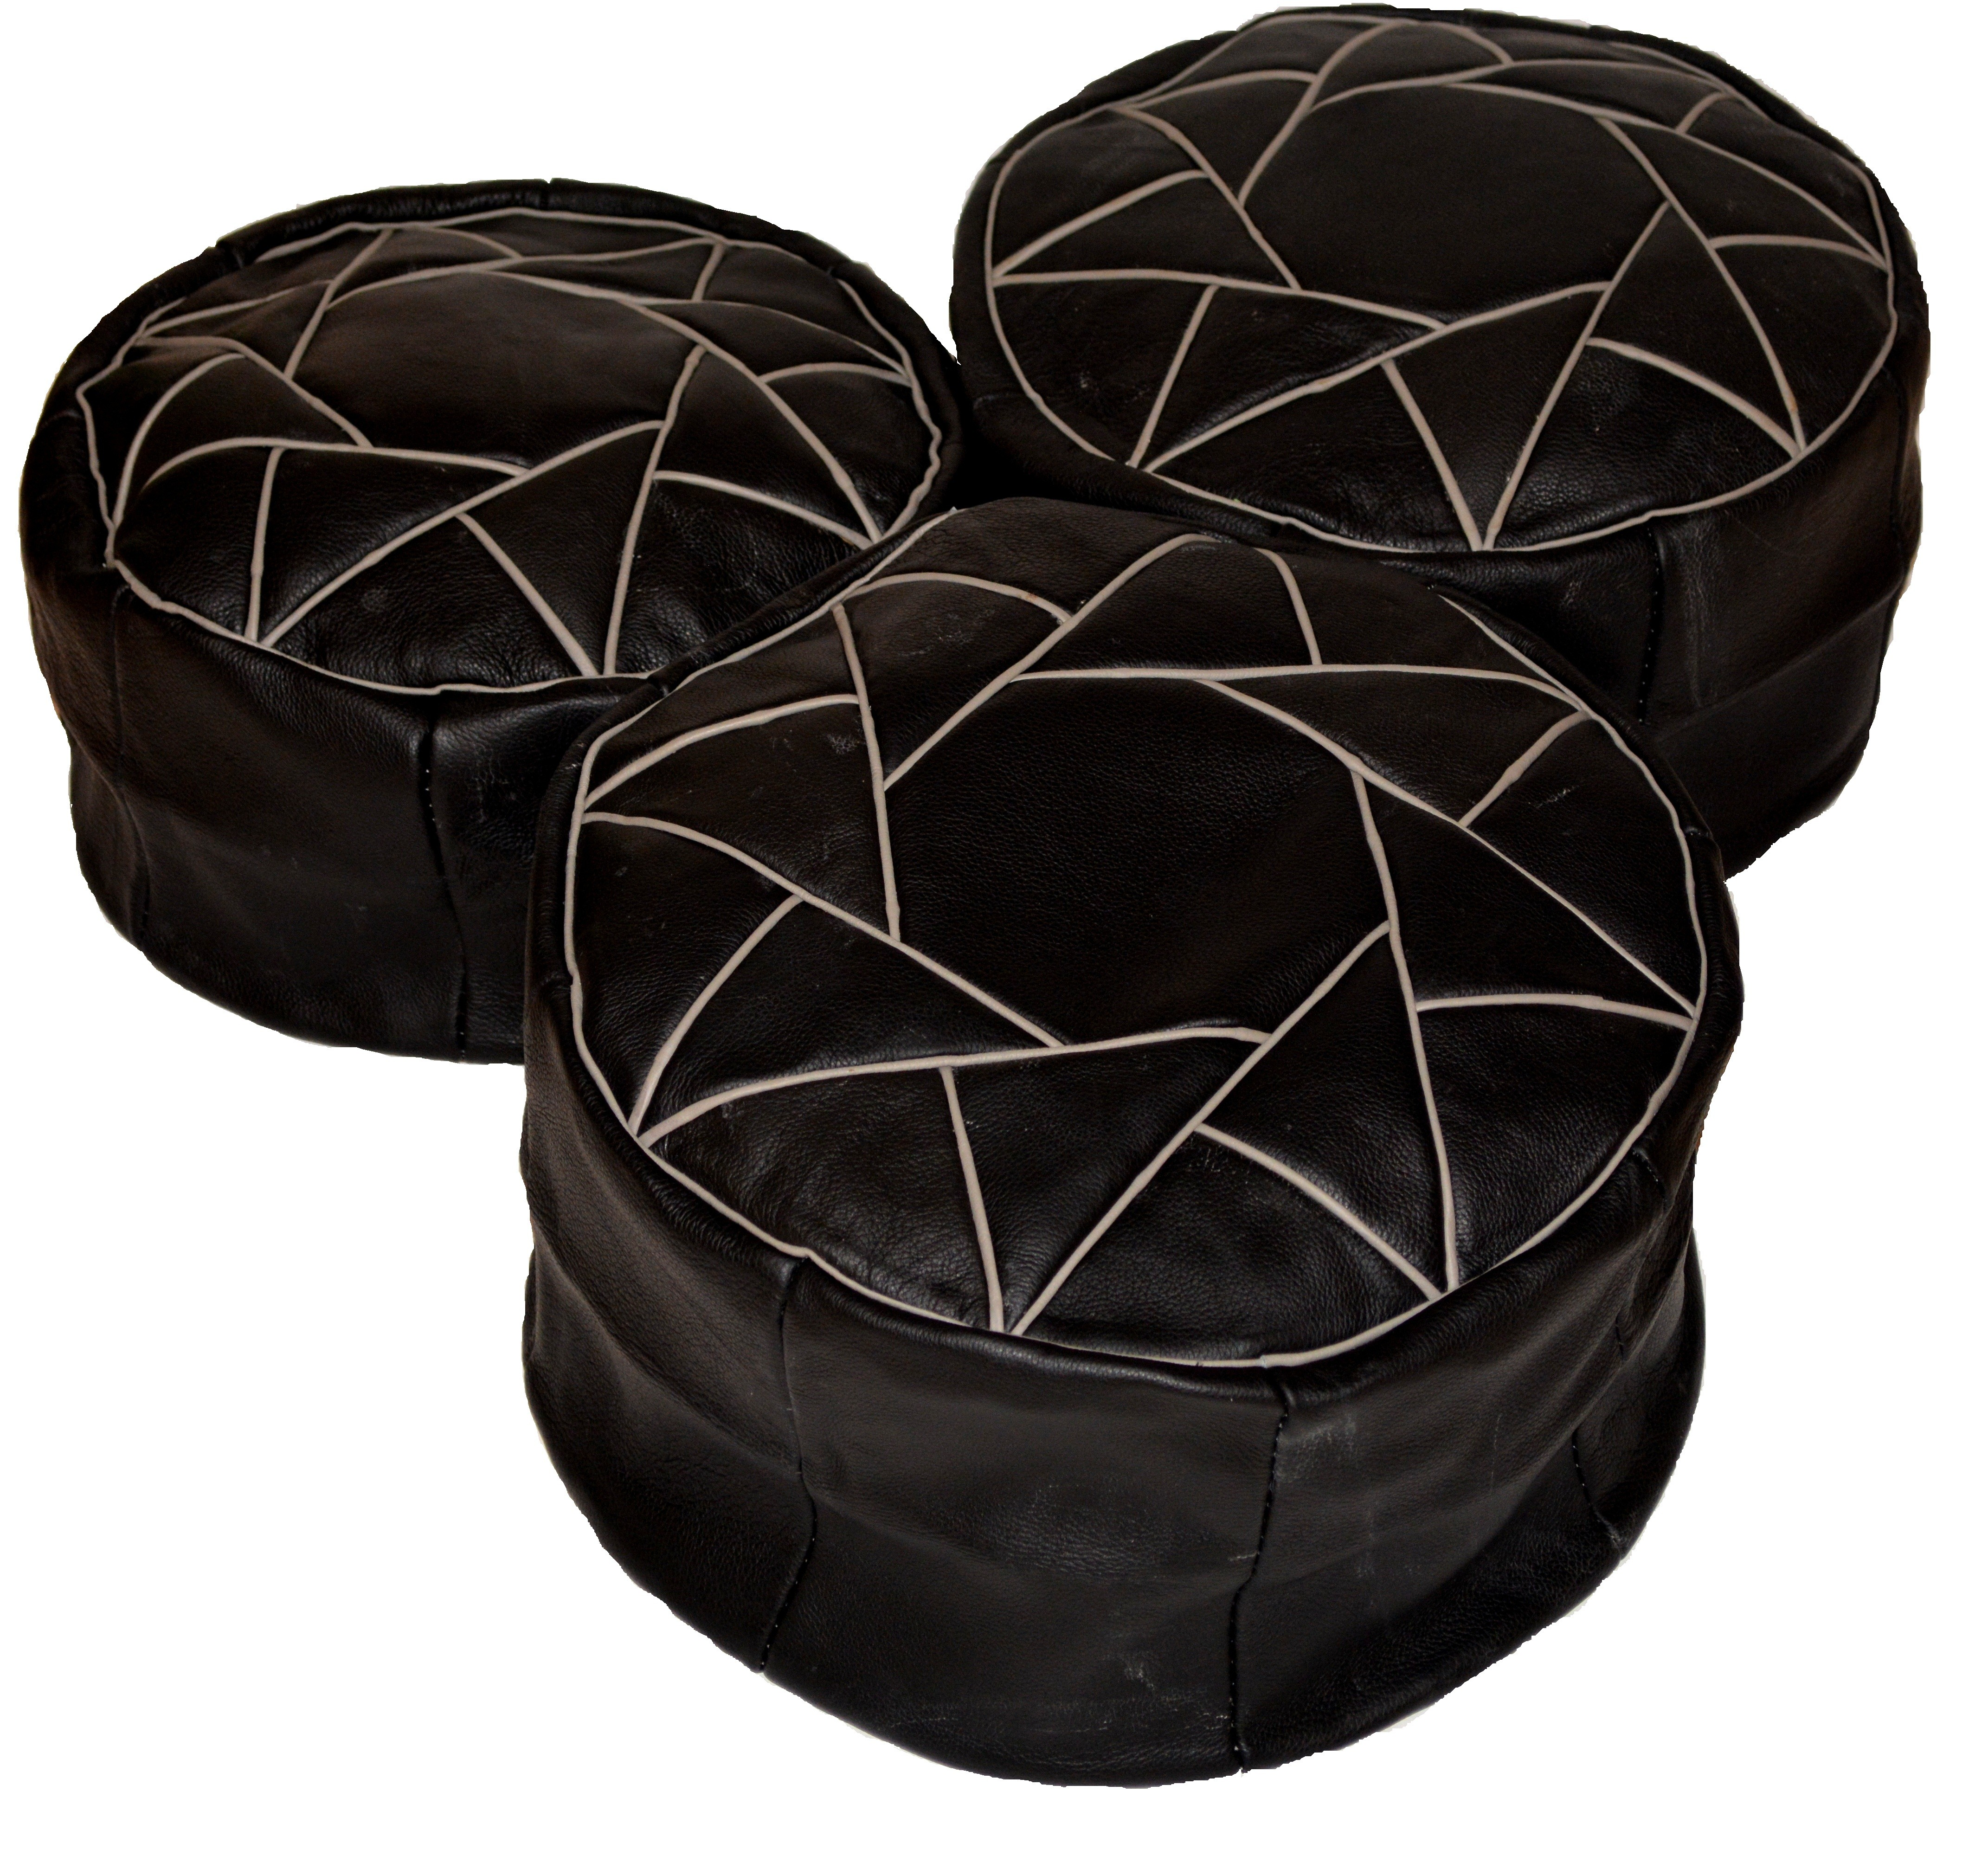 Prime Leather Pouf Round Leather Ottoman Black Inzonedesignstudio Interior Chair Design Inzonedesignstudiocom